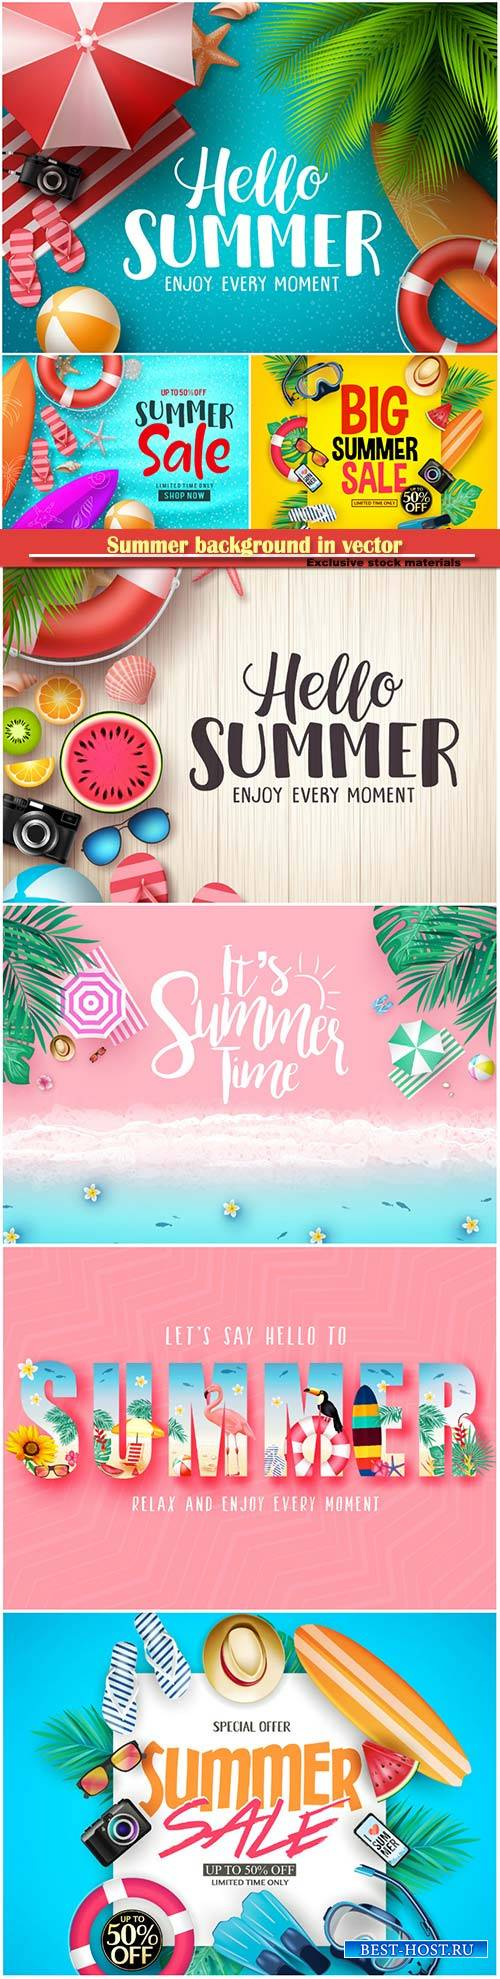 Summer background in vector